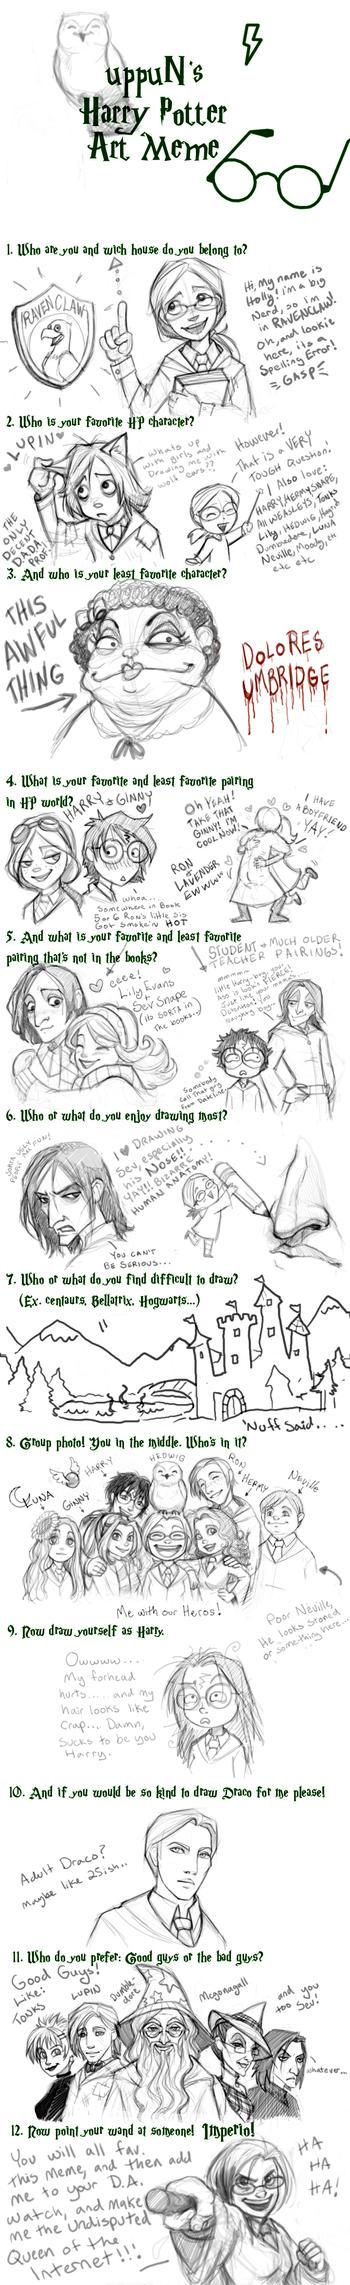 uppuN's HP Art meme by Luthie13